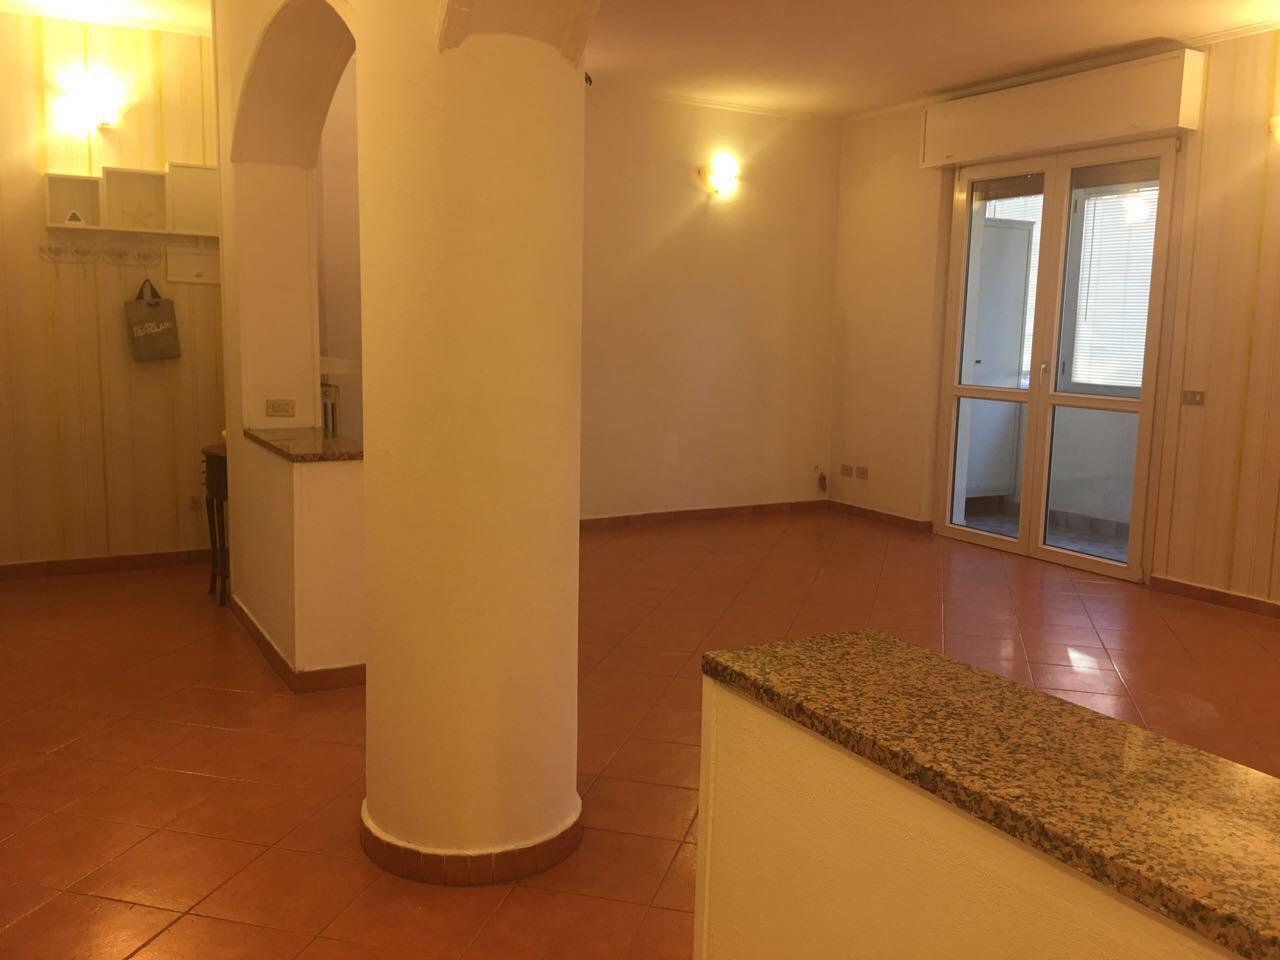 Milano | Appartamento in Vendita in VIA COGNE 7 | lacasadimilano.it